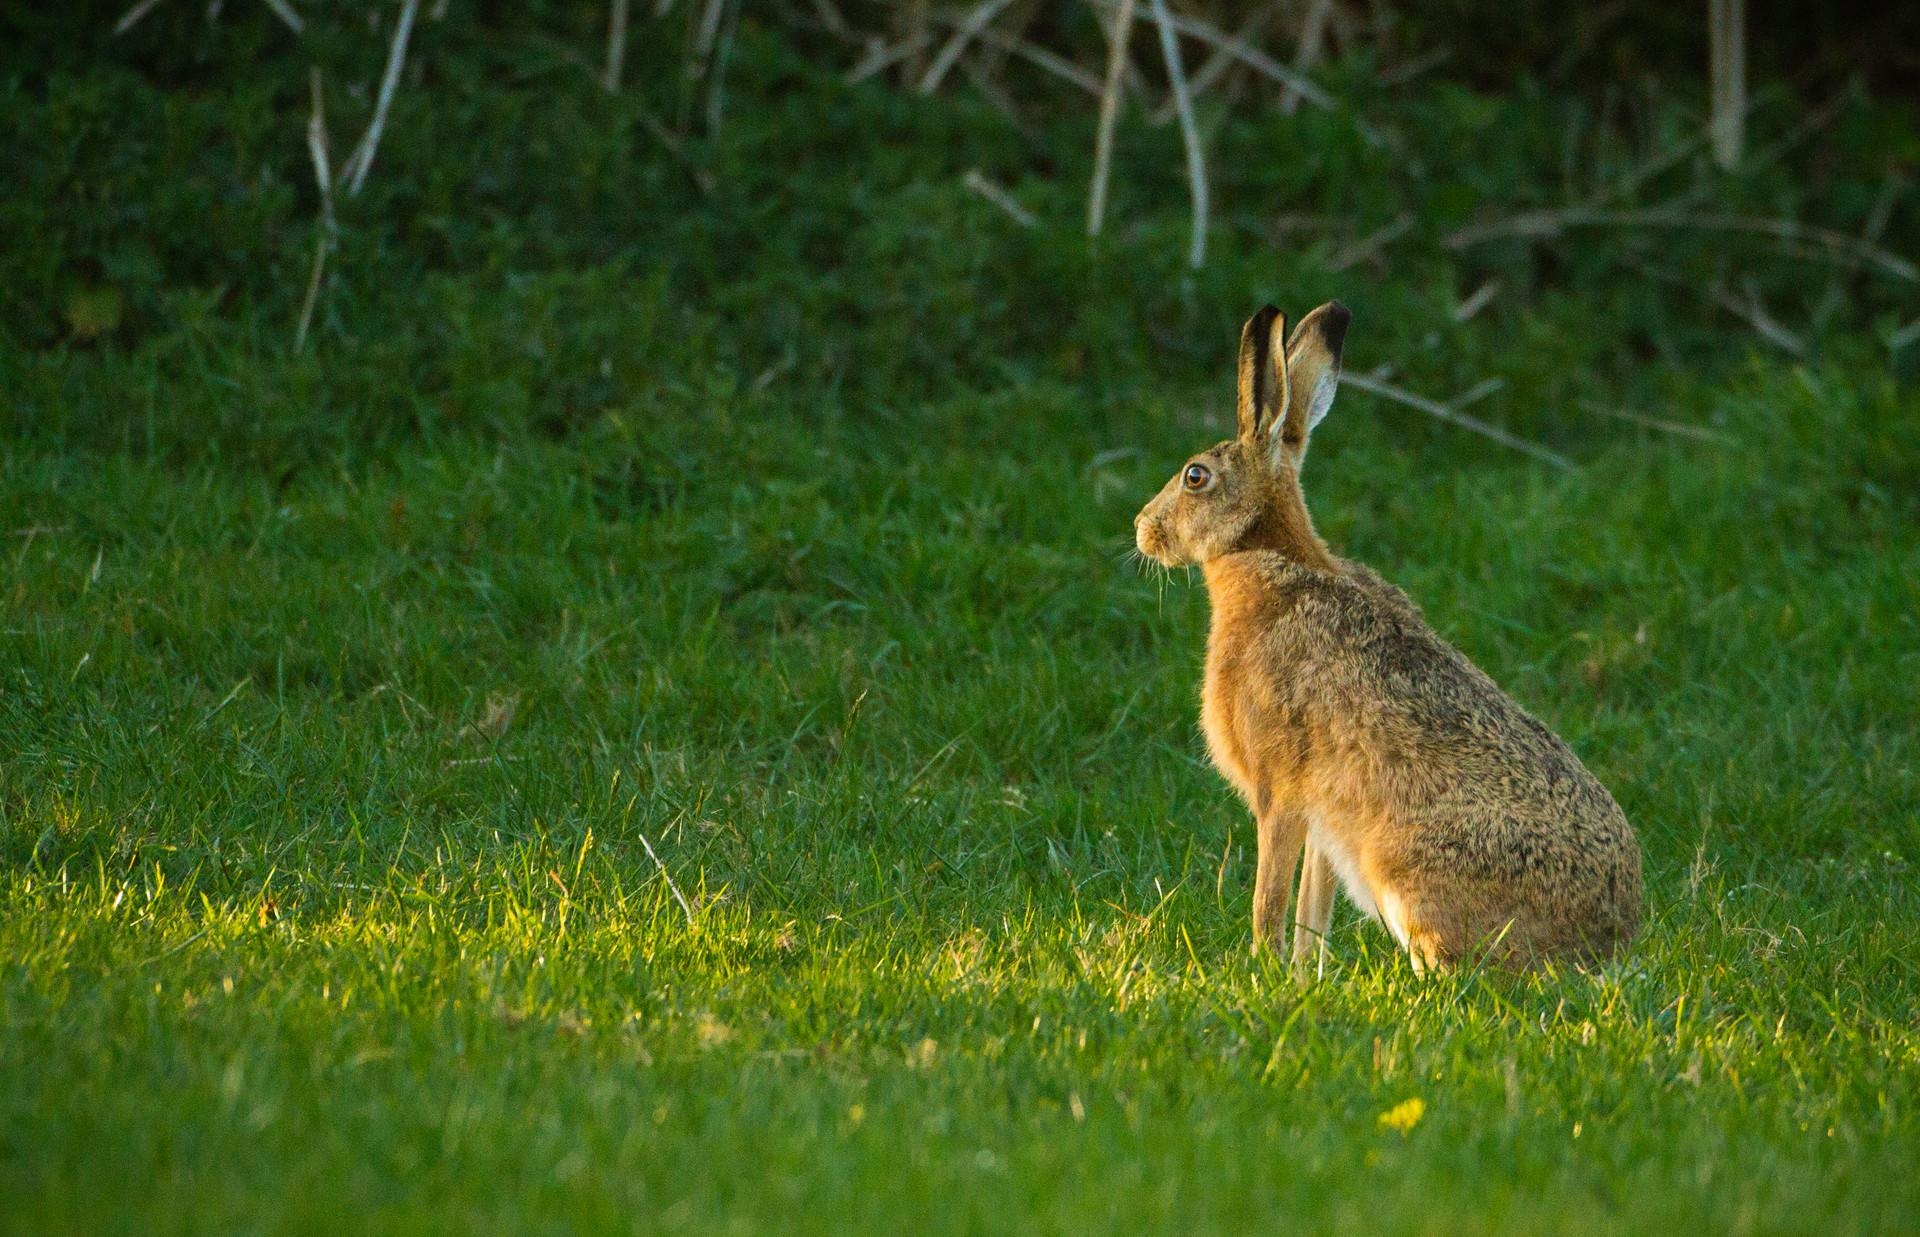 Sunset Hare